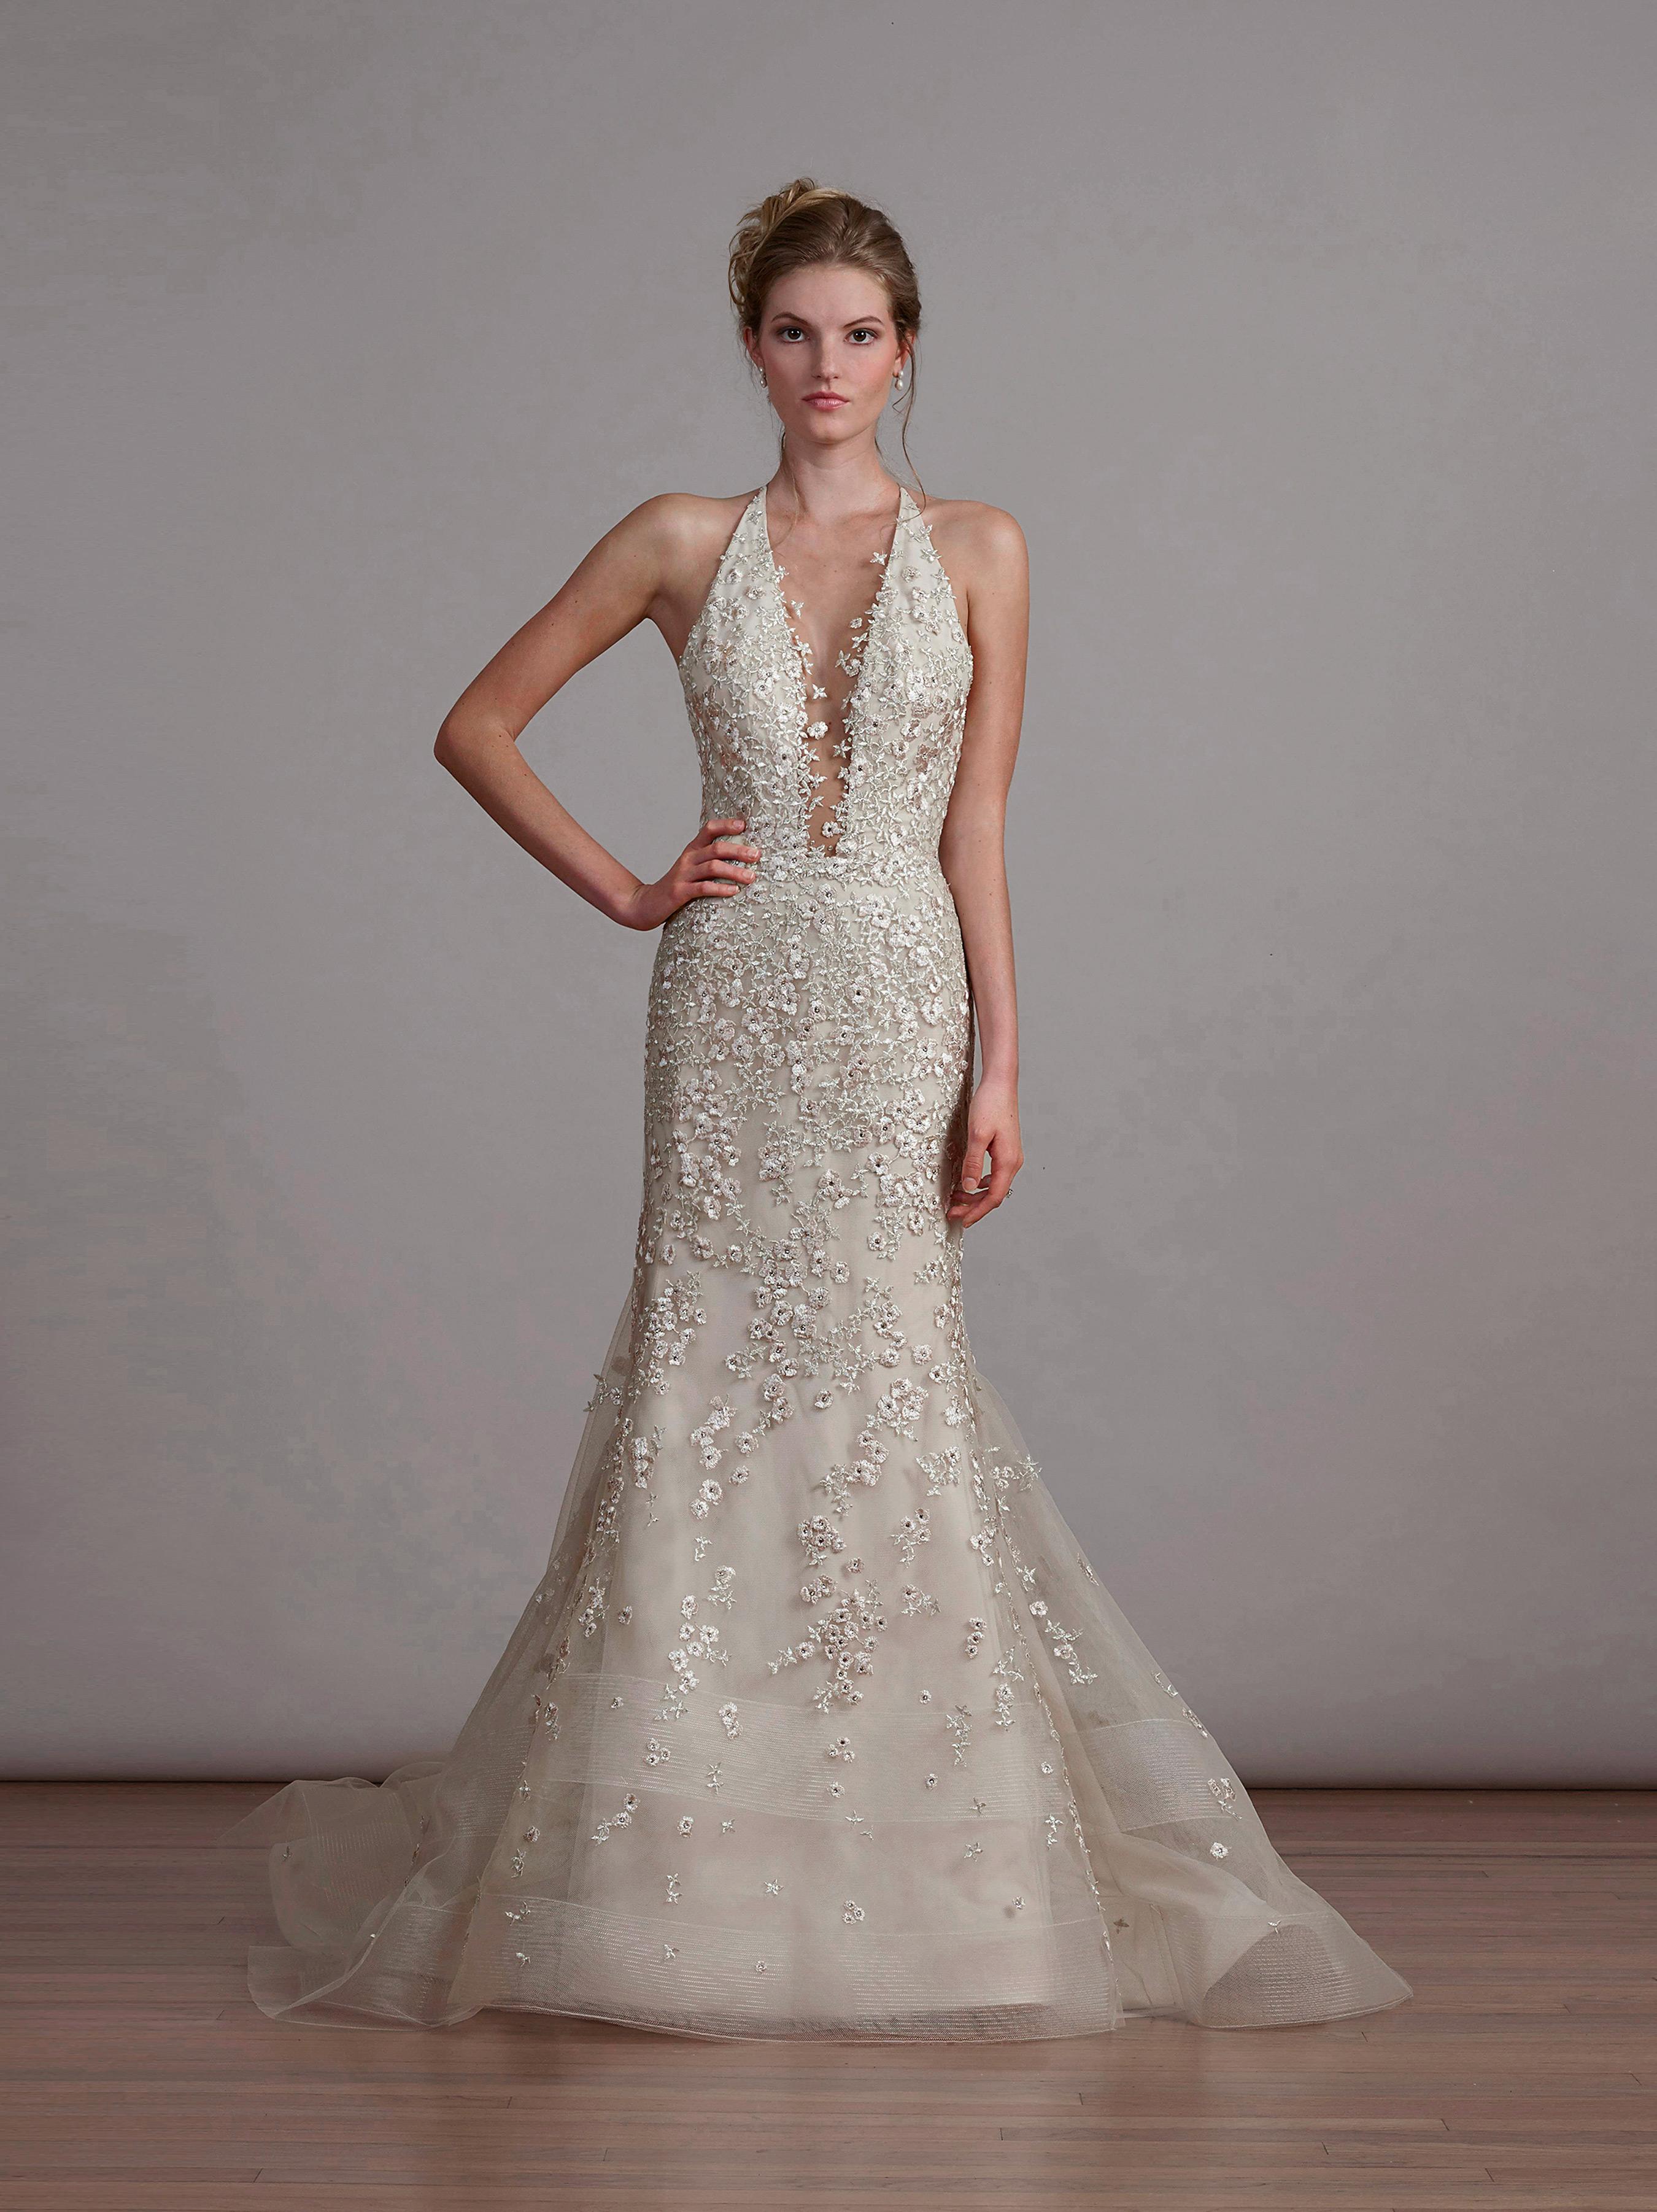 liancarlo halter wedding dress